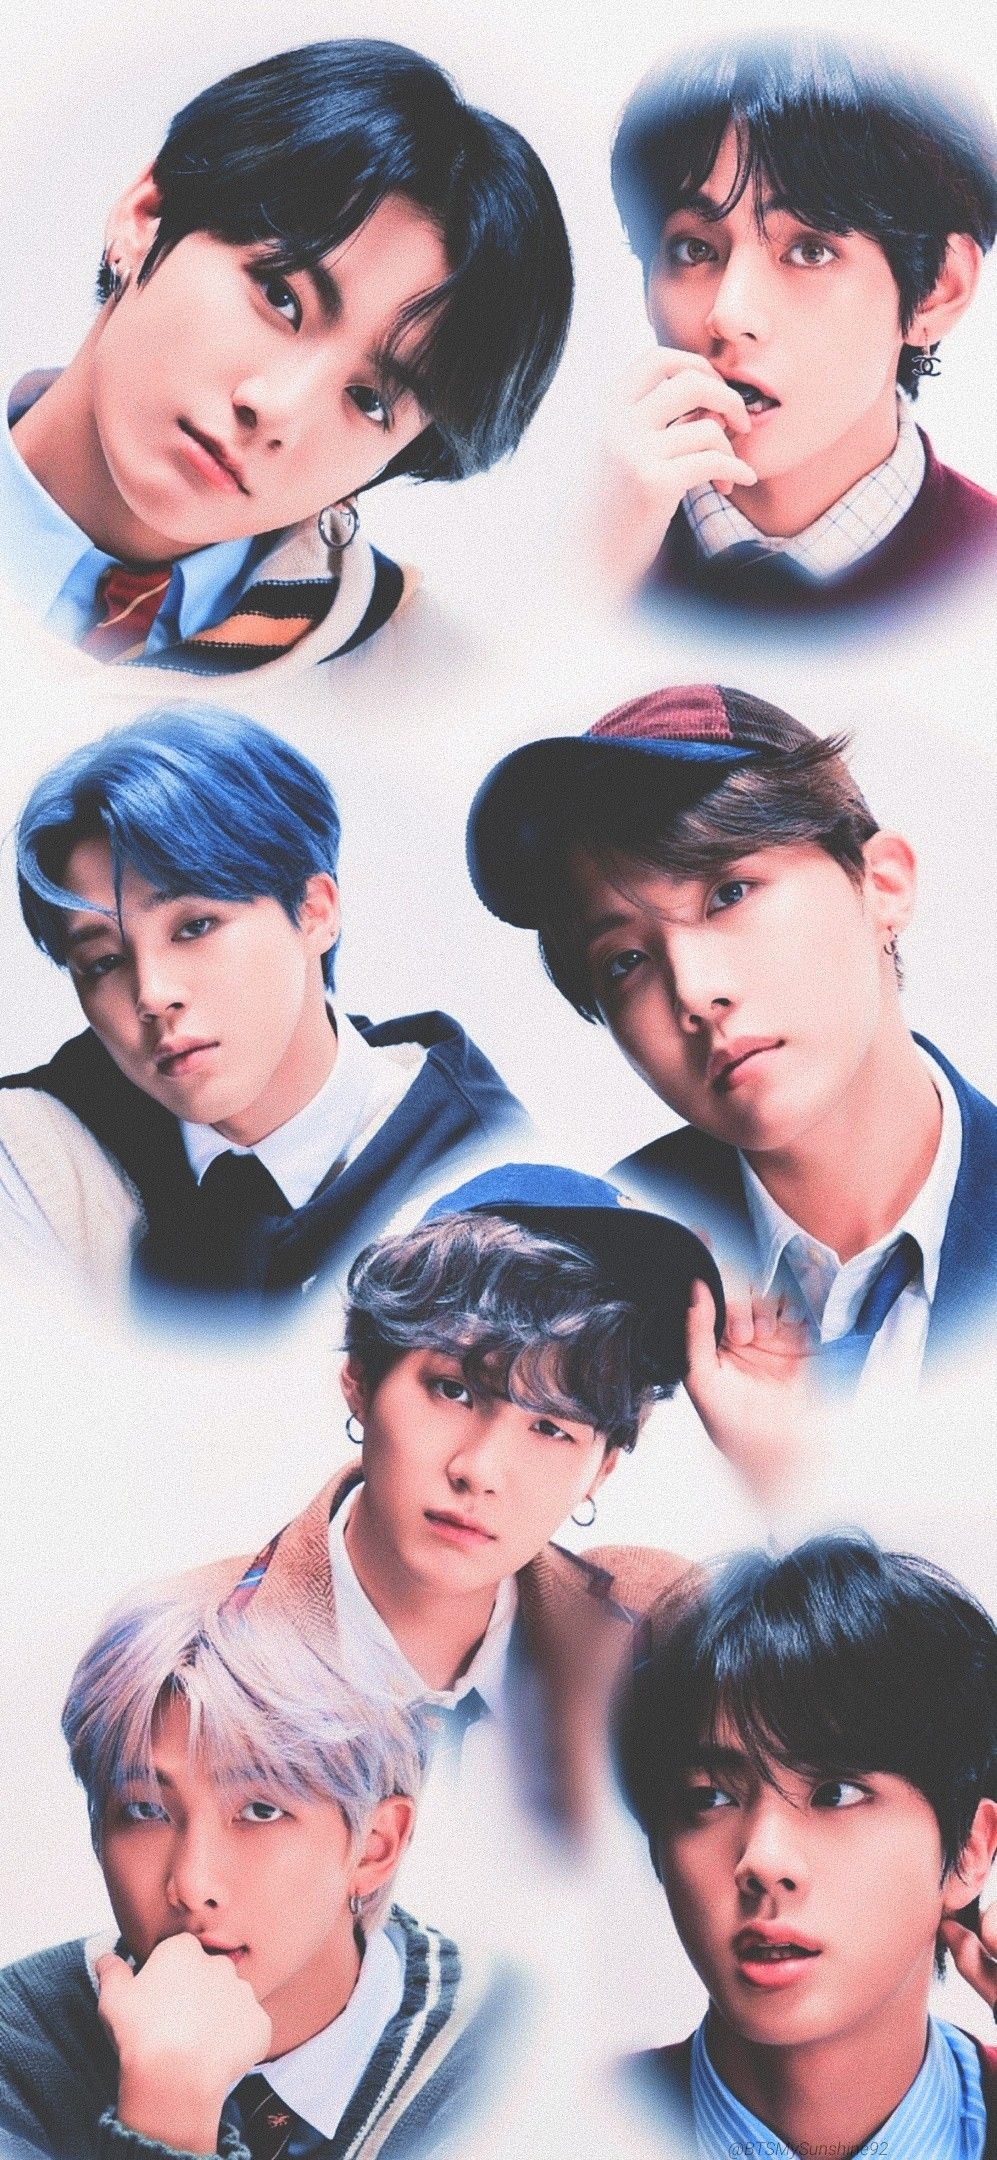 BTS 방탄소년단 MAP_OF_THE_SOUL_7 Concept Photo version 4 di